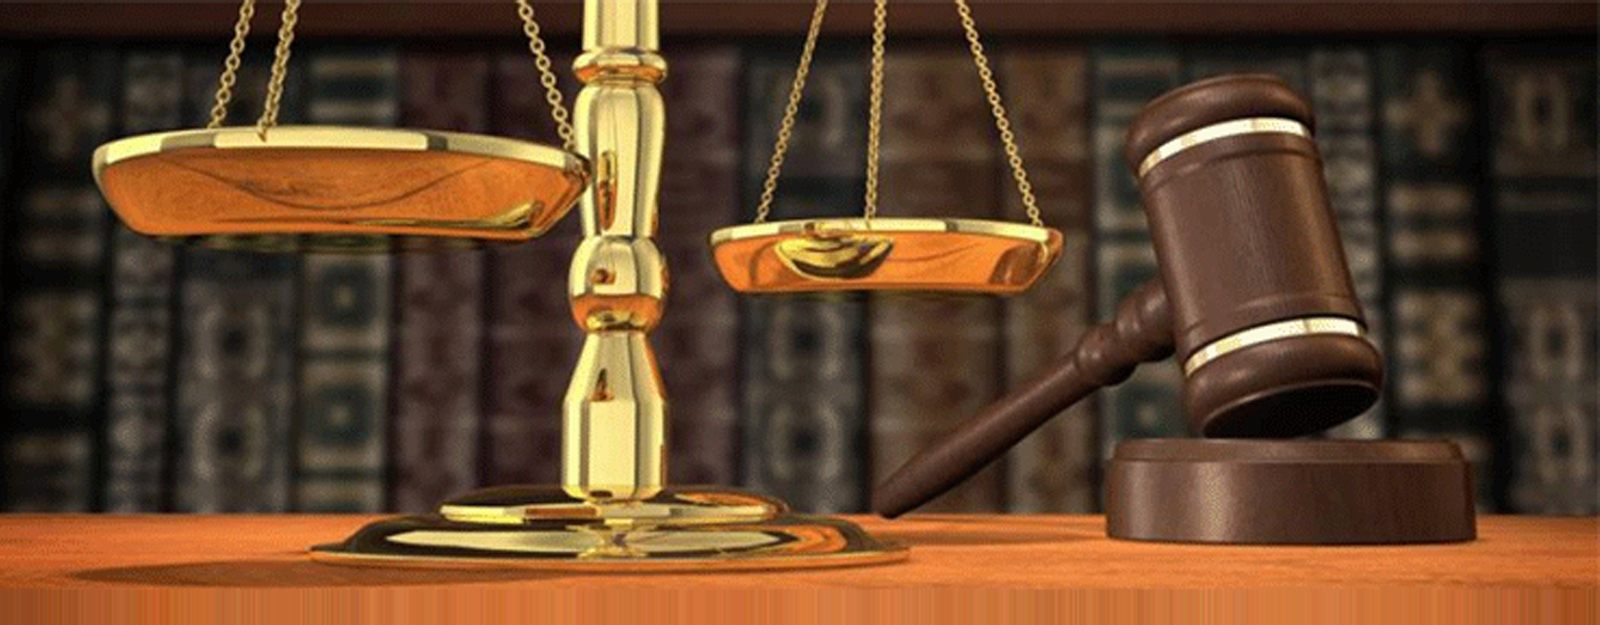 Consultoria e Serviços Jurídicos